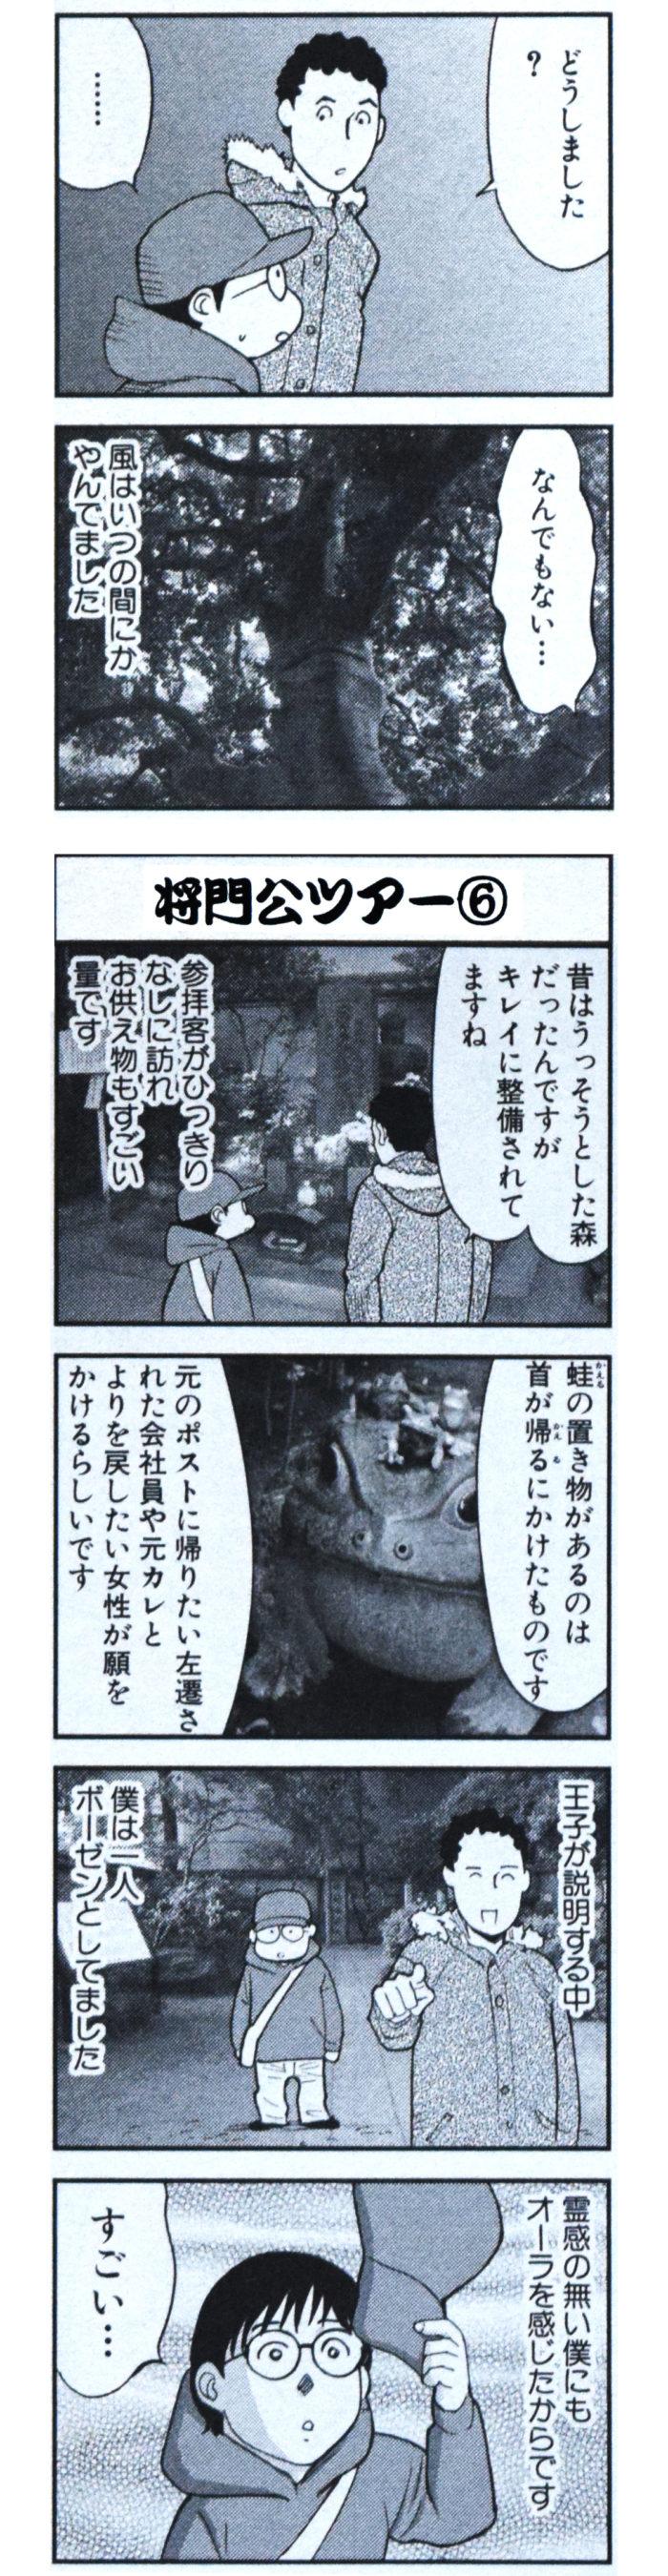 torihada-syoumon2-03